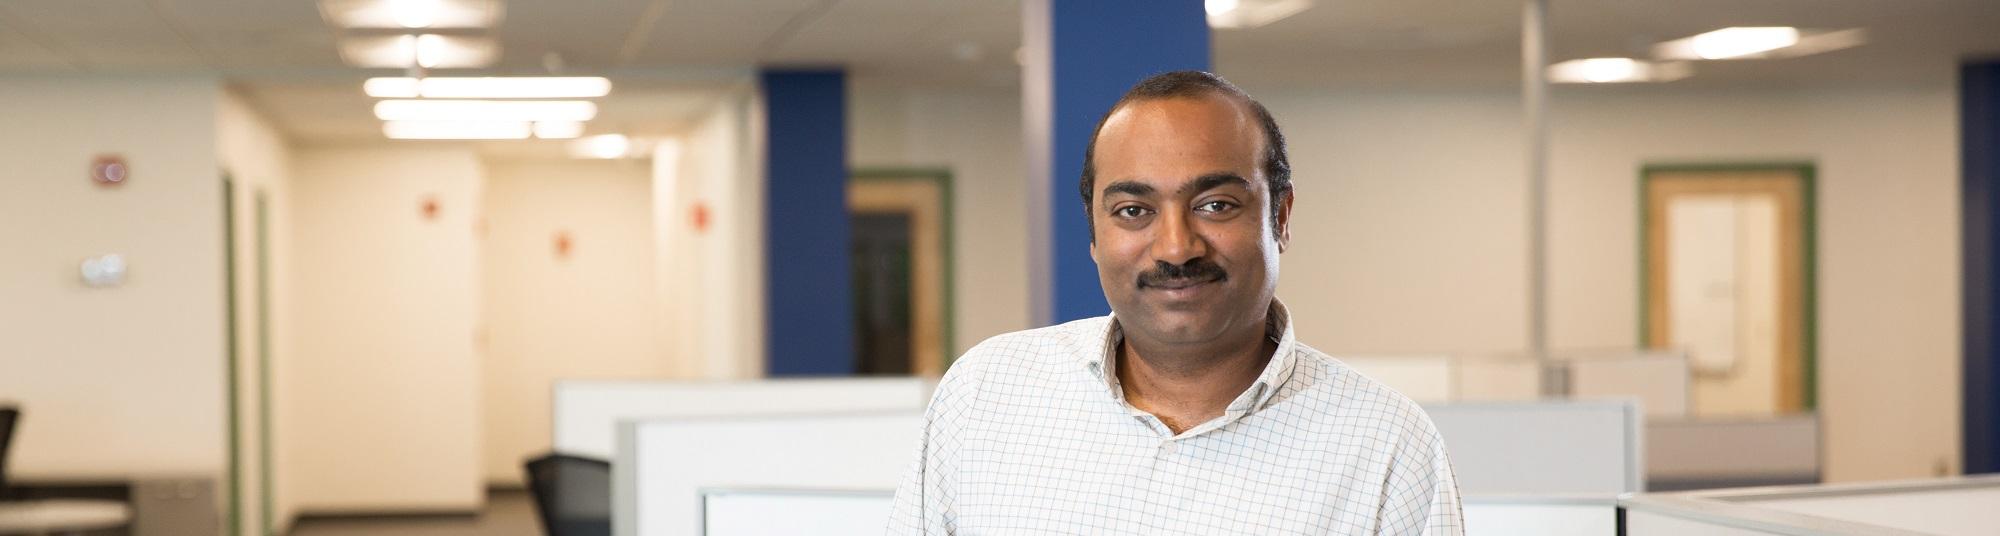 Sudhakar Deenadayalan - AKA Enterprise Solutions Slider